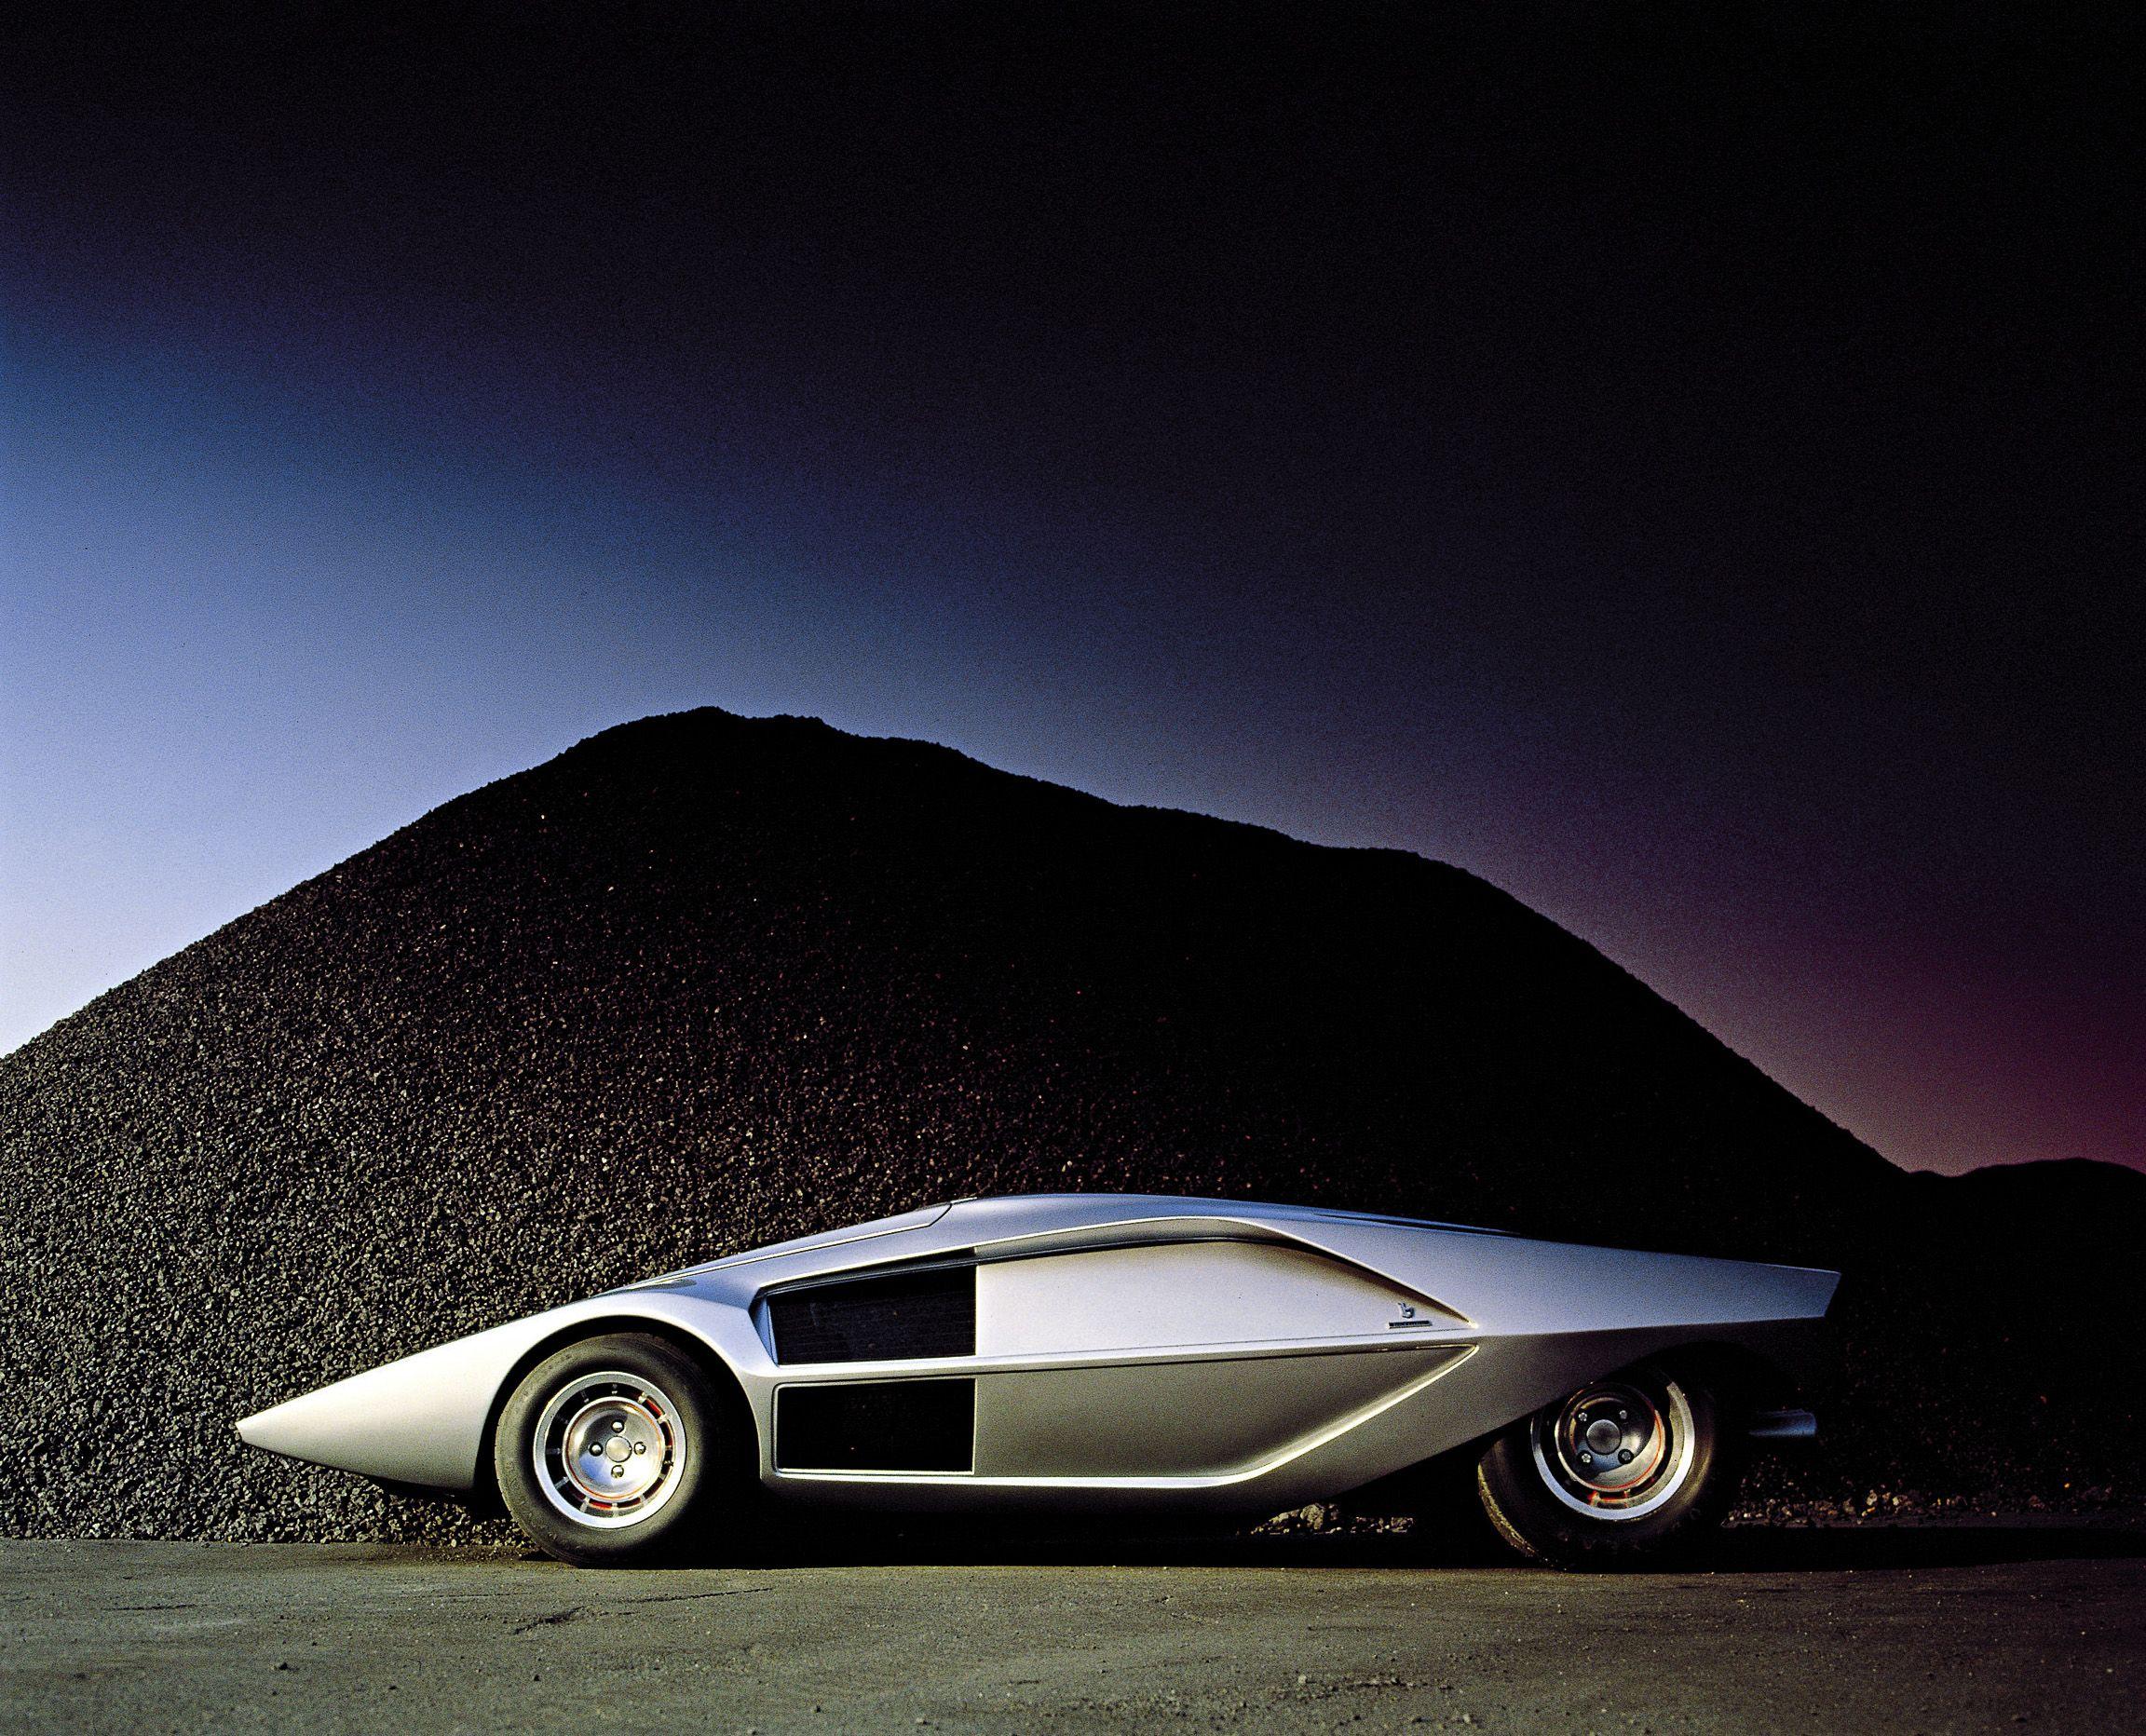 8f3a2ca2ff621fb17553768e07388be7 Breathtaking Lamborghini Countach Need for Speed Cars Trend